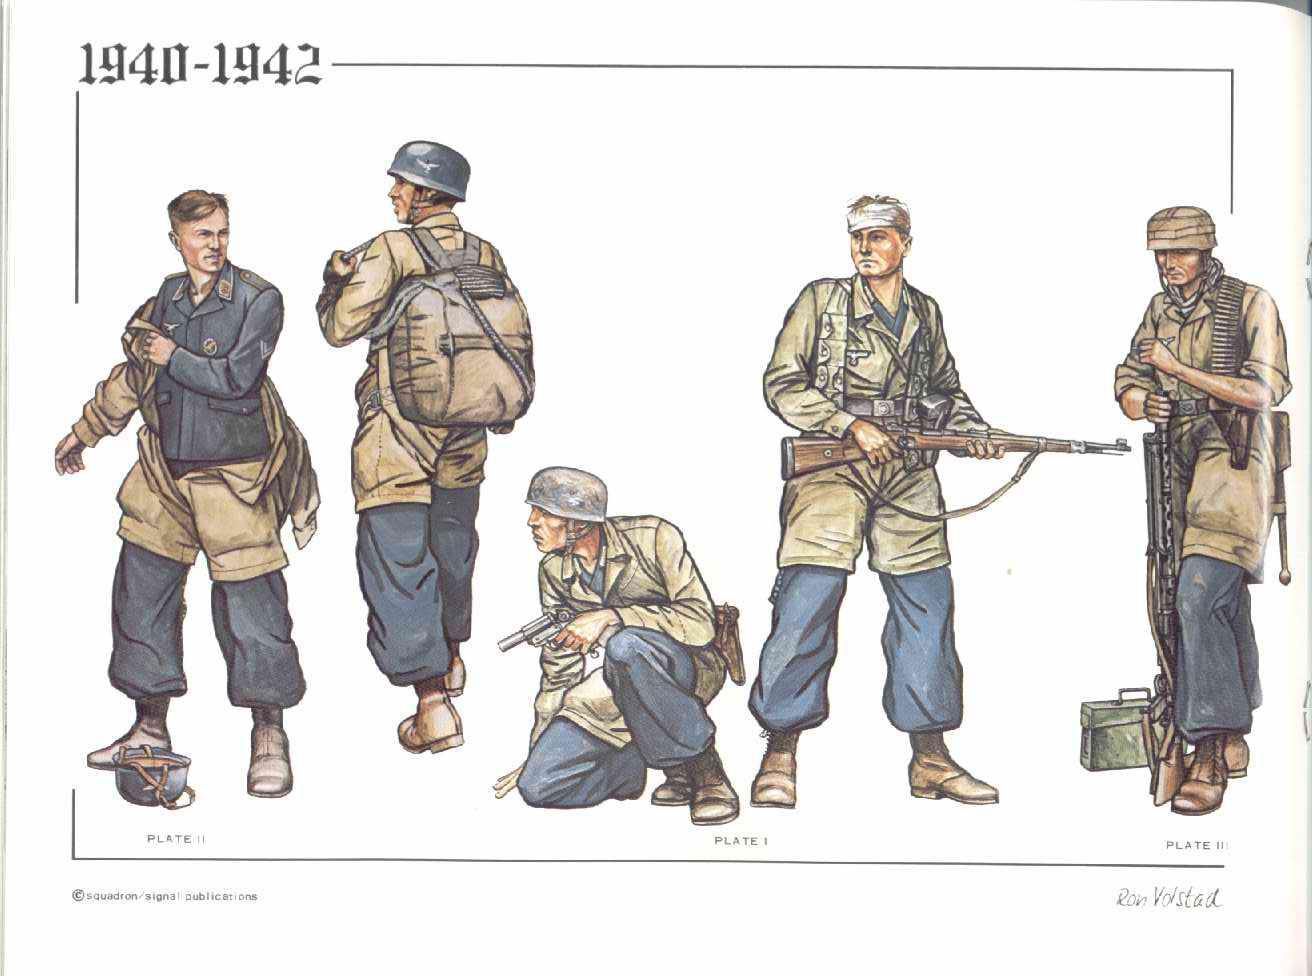 Squadron Signal 3001 Combat Troops Fallschmirjagers_Страница_26.jpg